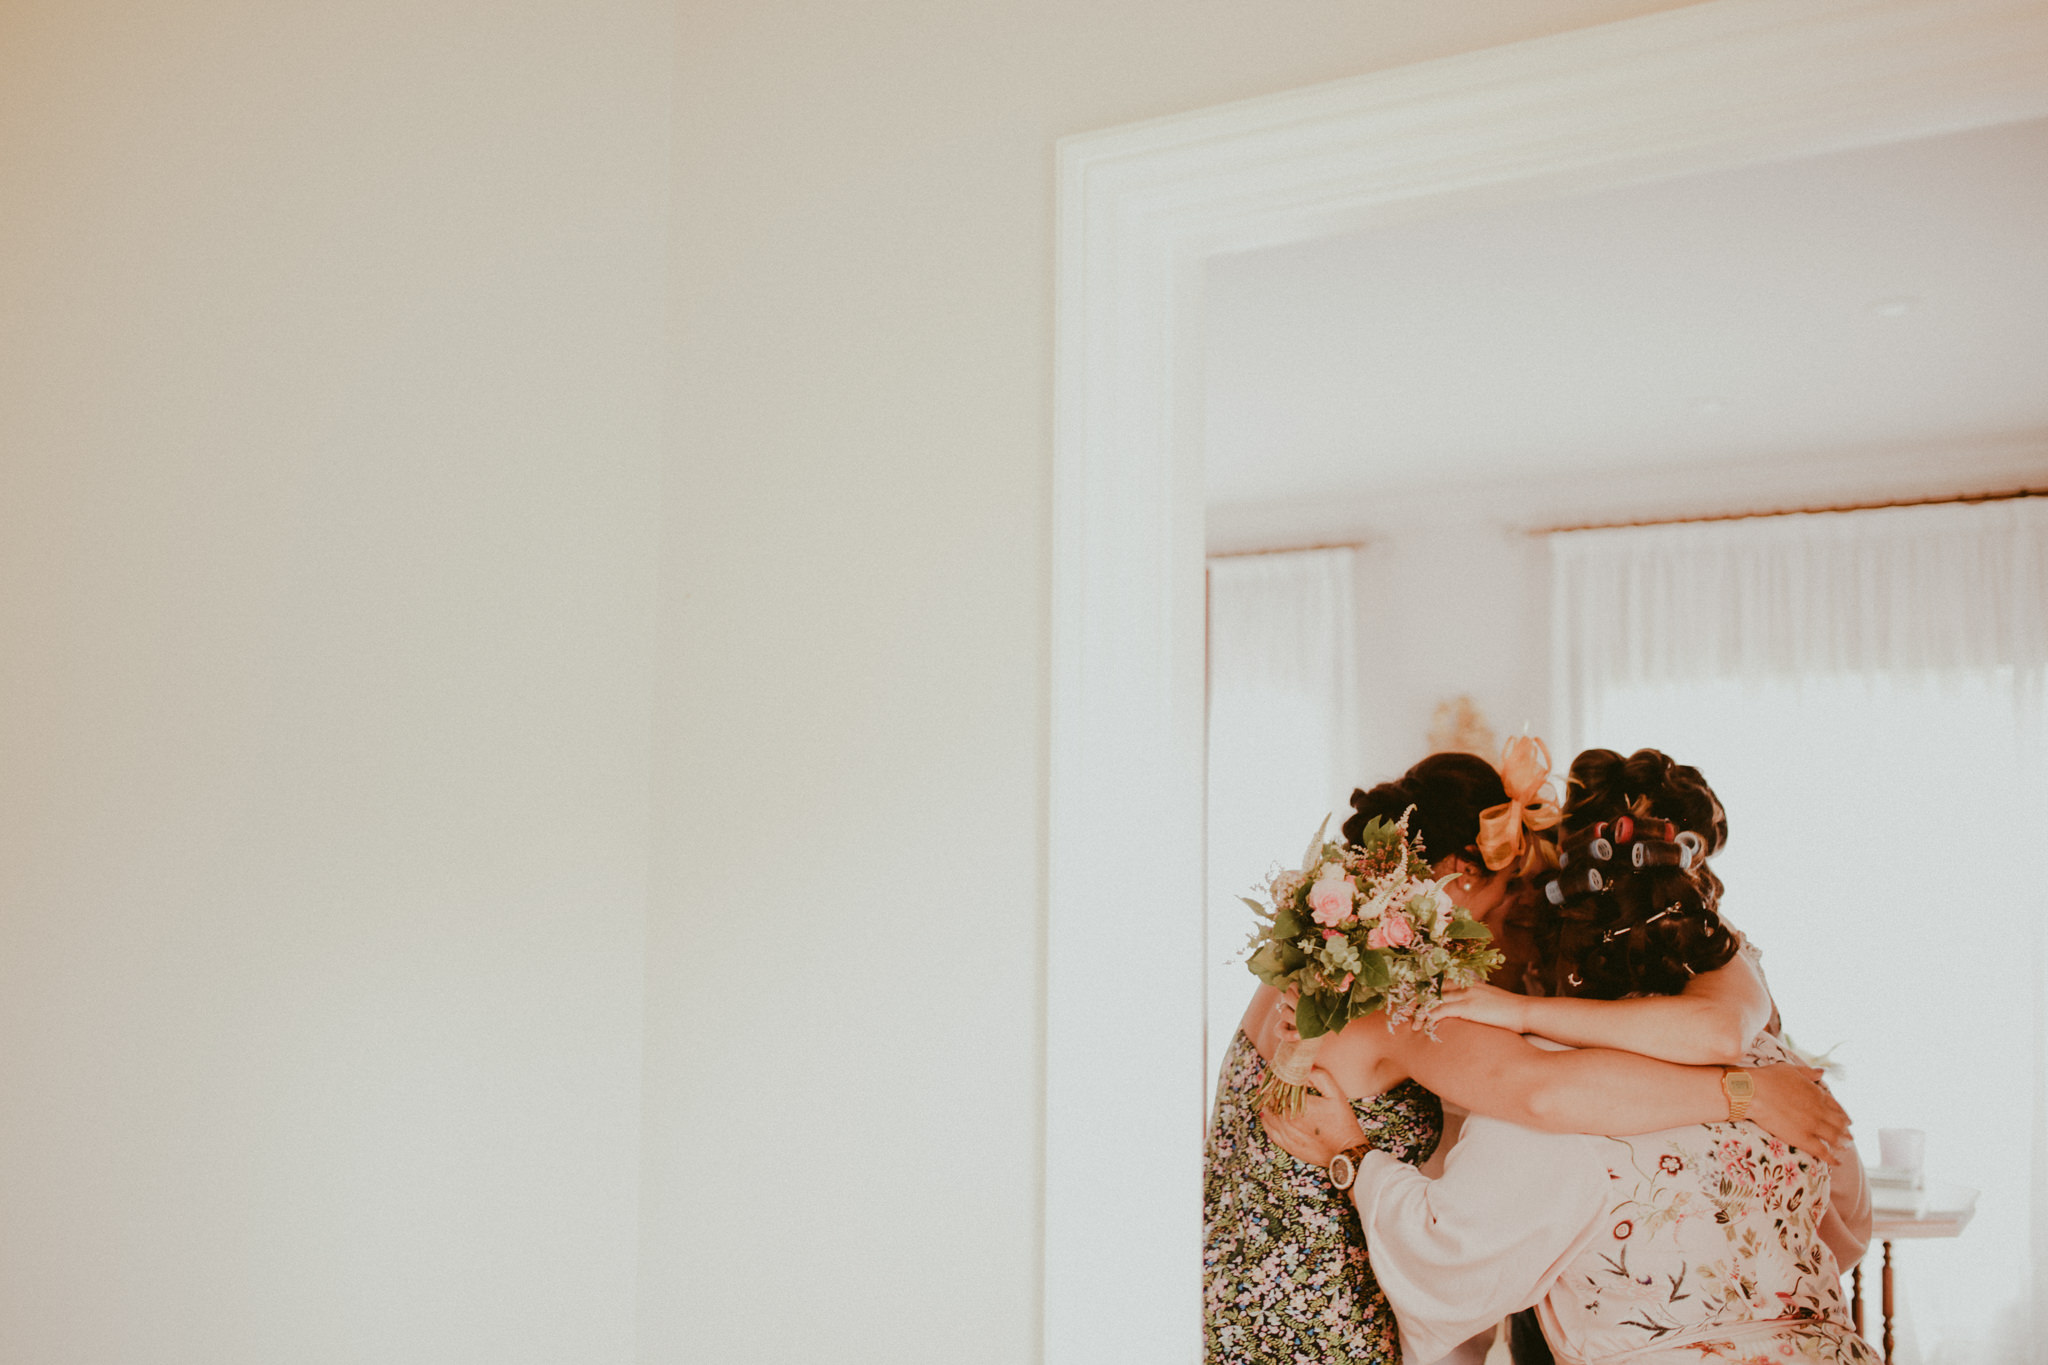 boda-diferente-fotografo-boda-laspalmas-grancanaria-8